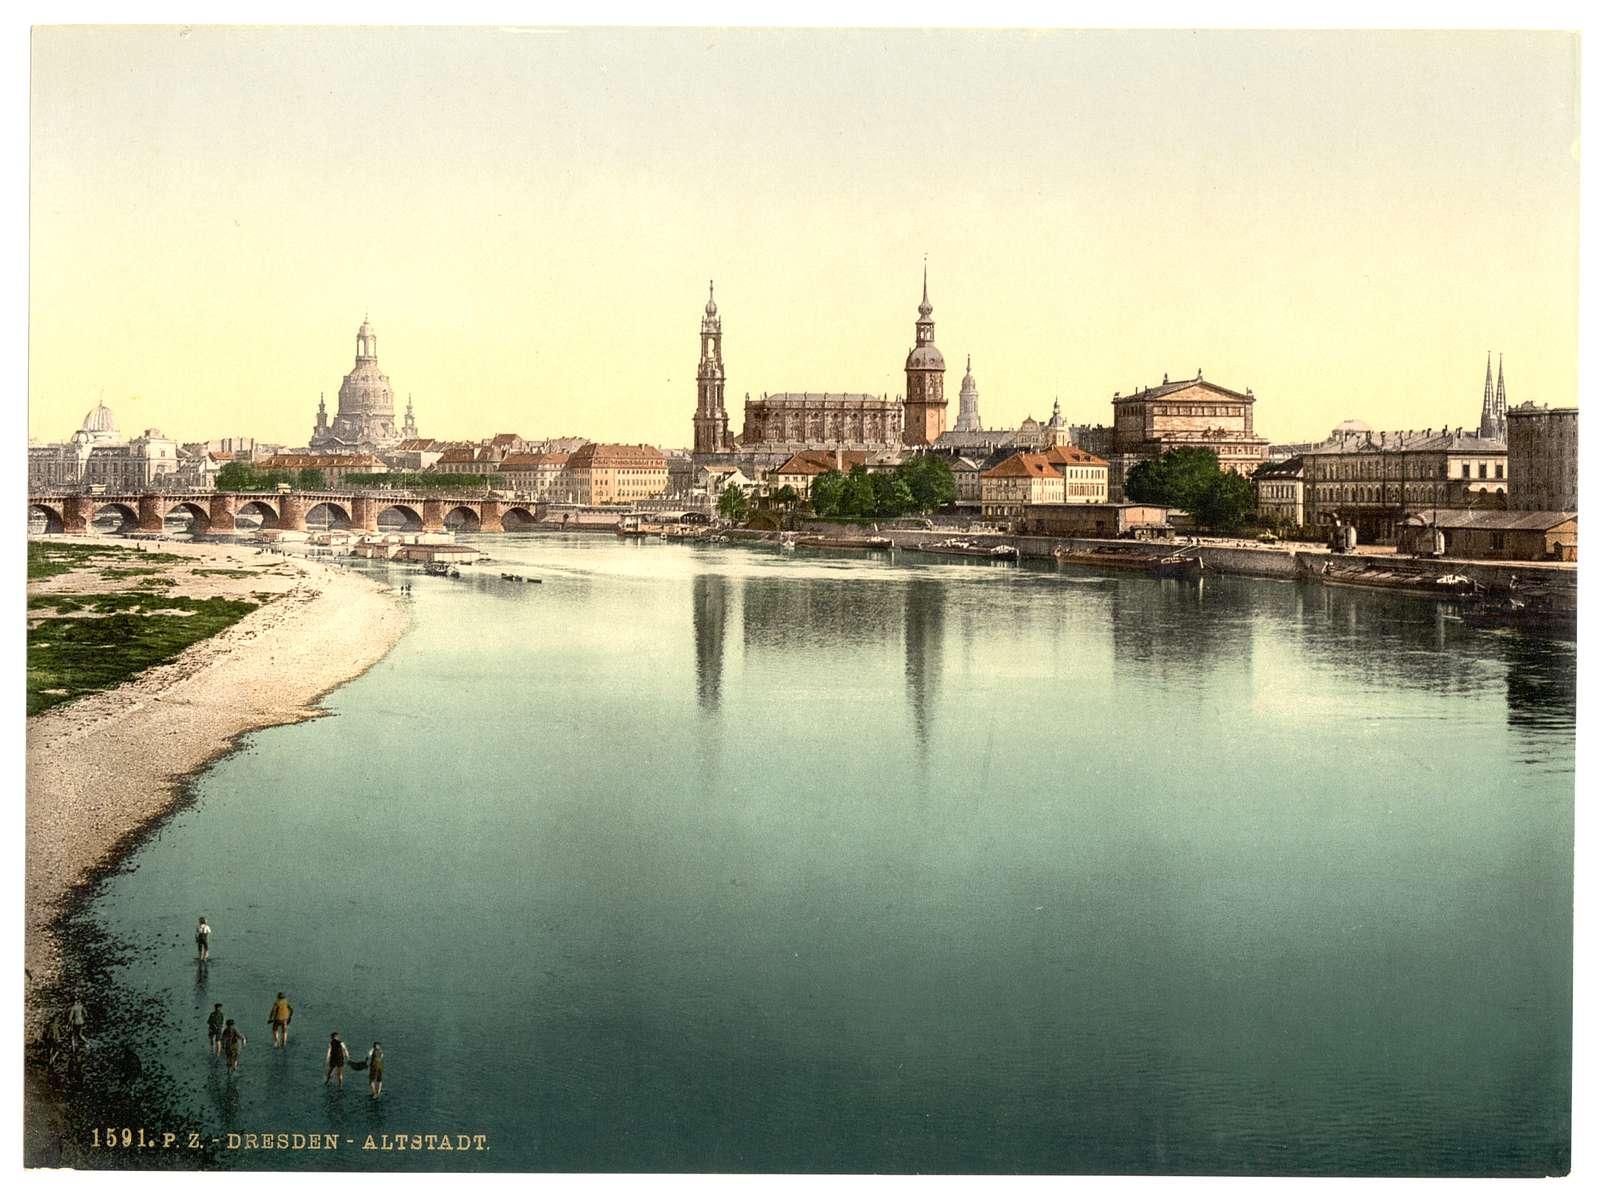 [Altstadt, Dresden, seen from the Marienbrucke, Saxony, Germany]